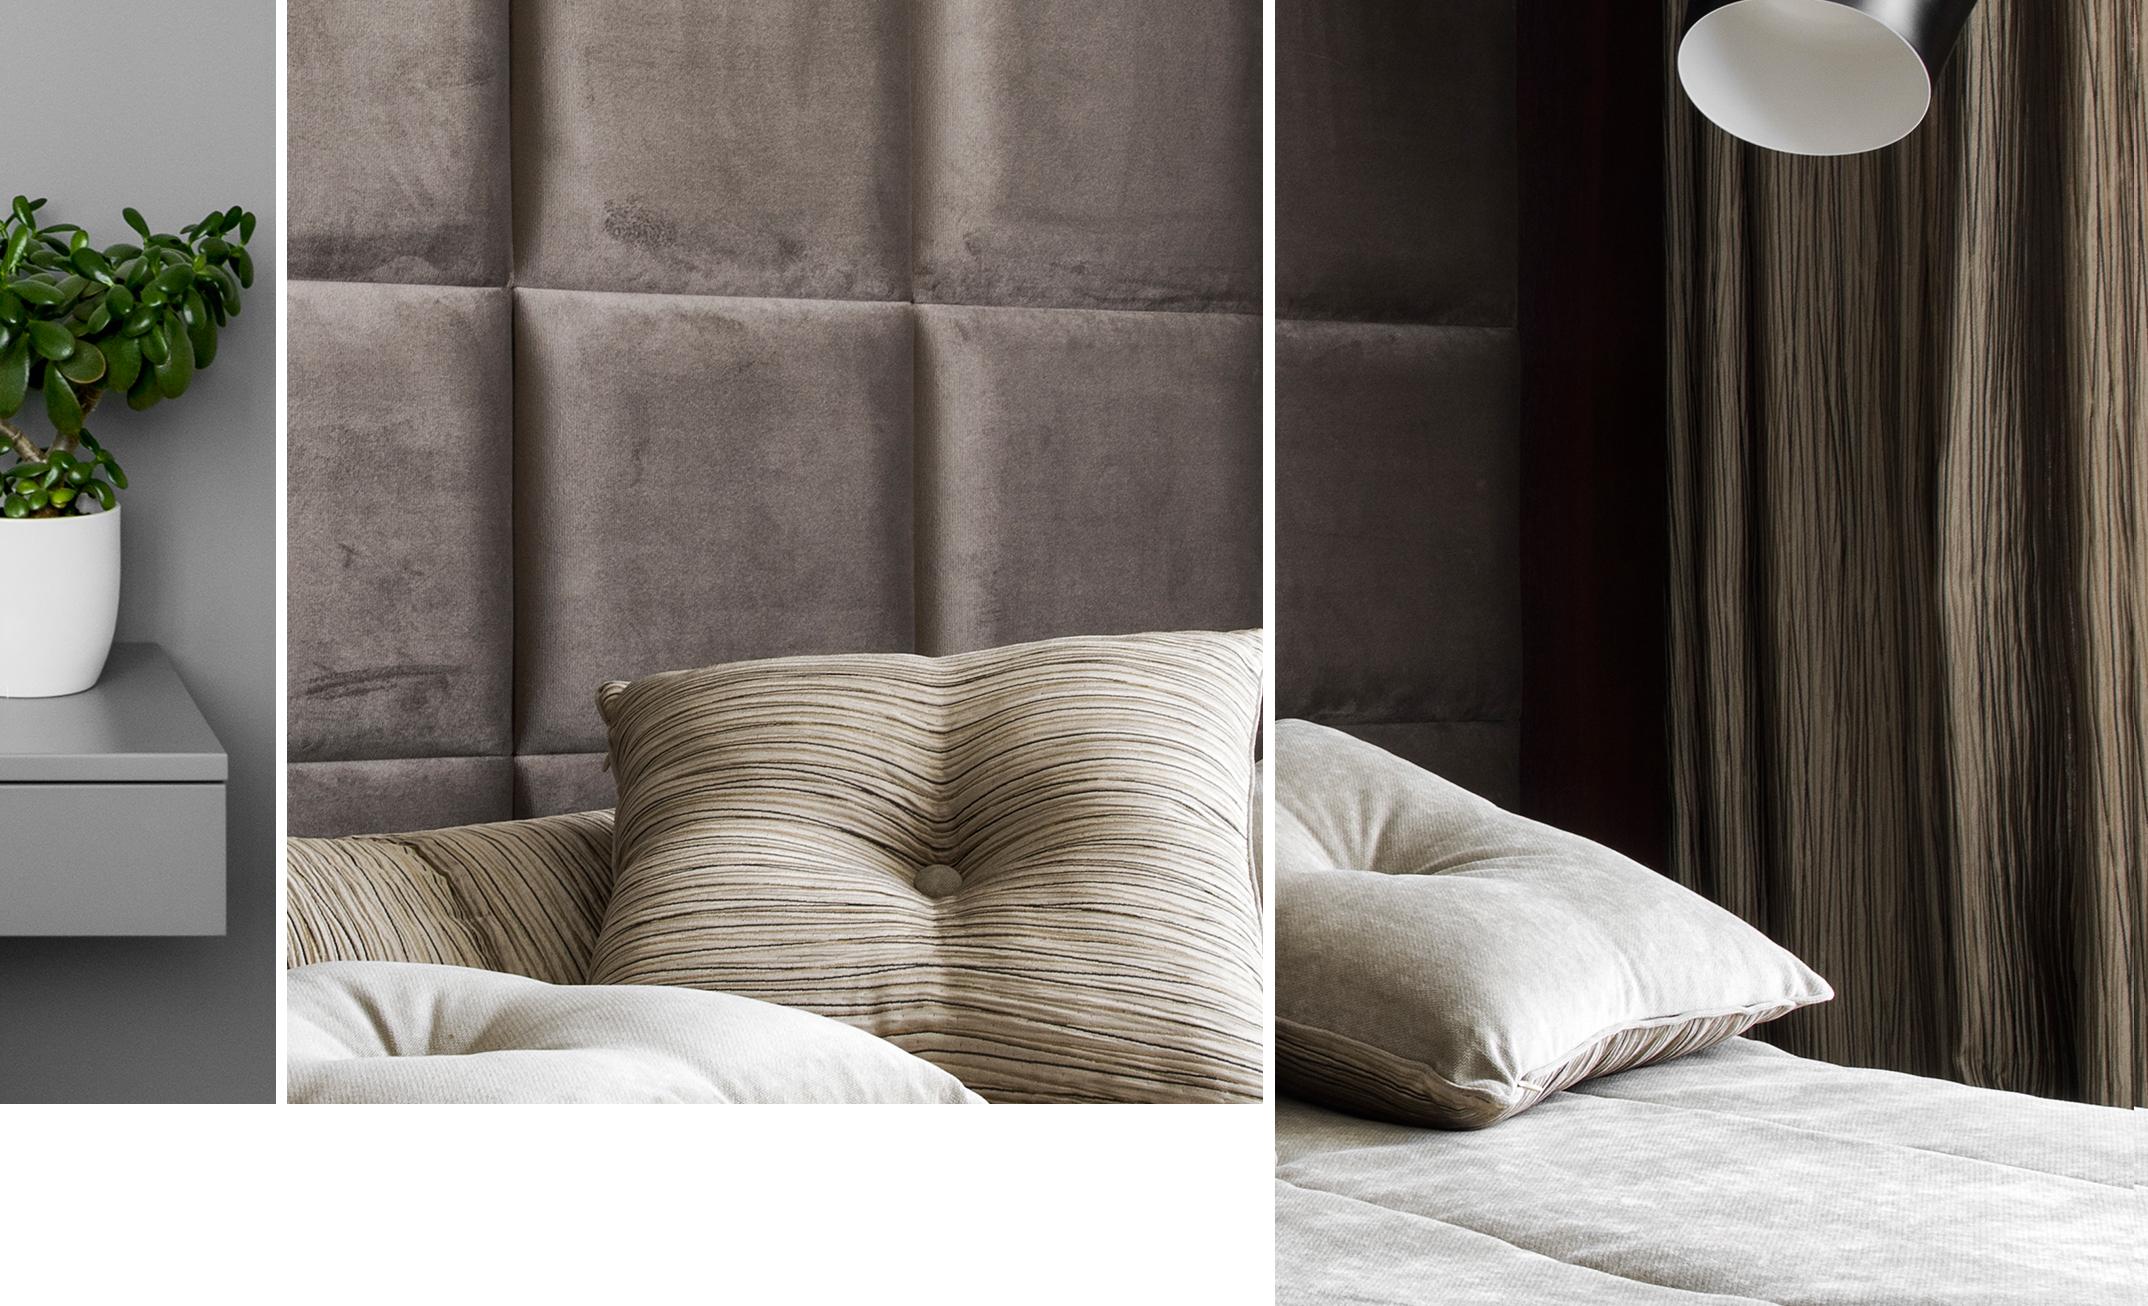 EJtekstile–-interjero-tekstiles-projektavimo-studija--Interior-textile-design-studio-3